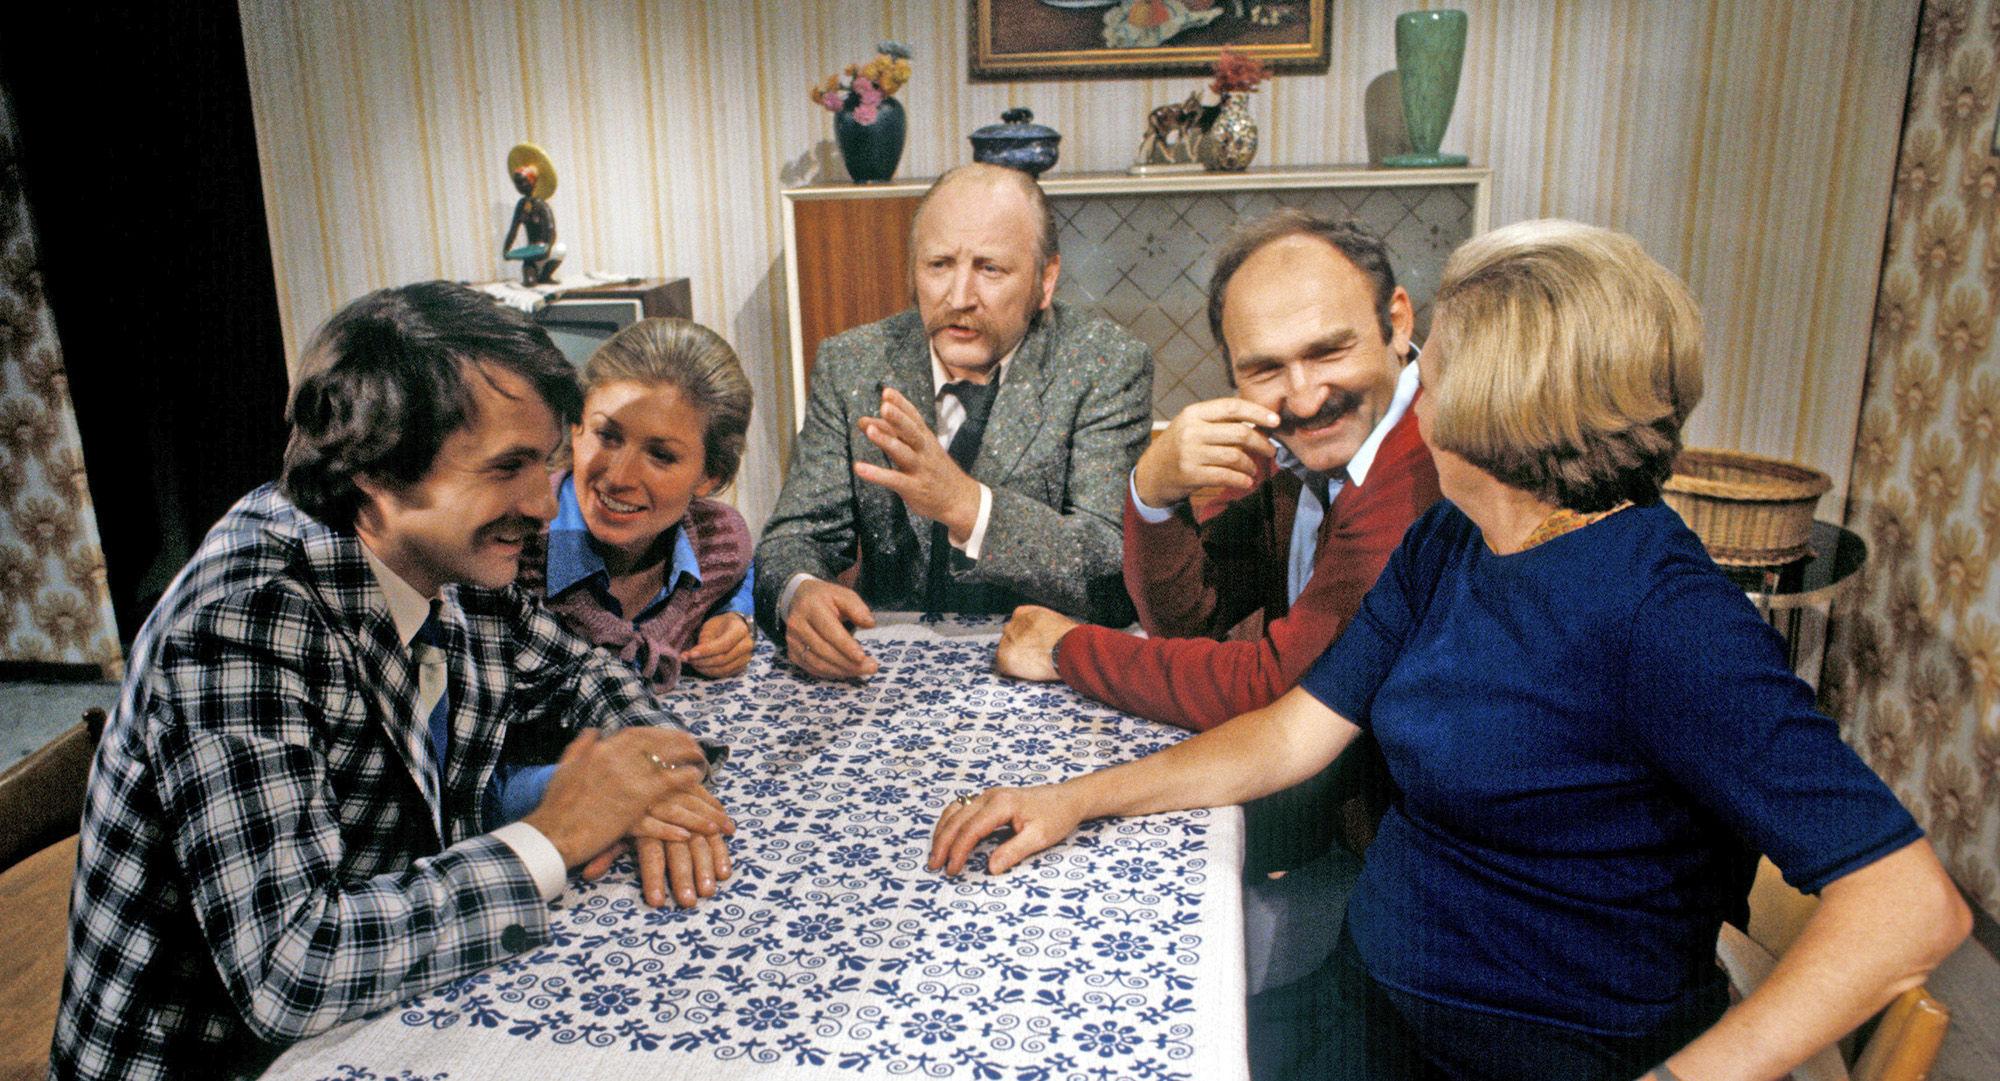 Karli (Klaus Rott), Irmi (Liliana Nelska), Mundl (Karl Merkatz), Herr Werner (Jaromir Borek), Martha Werner (Ilse Hanel)